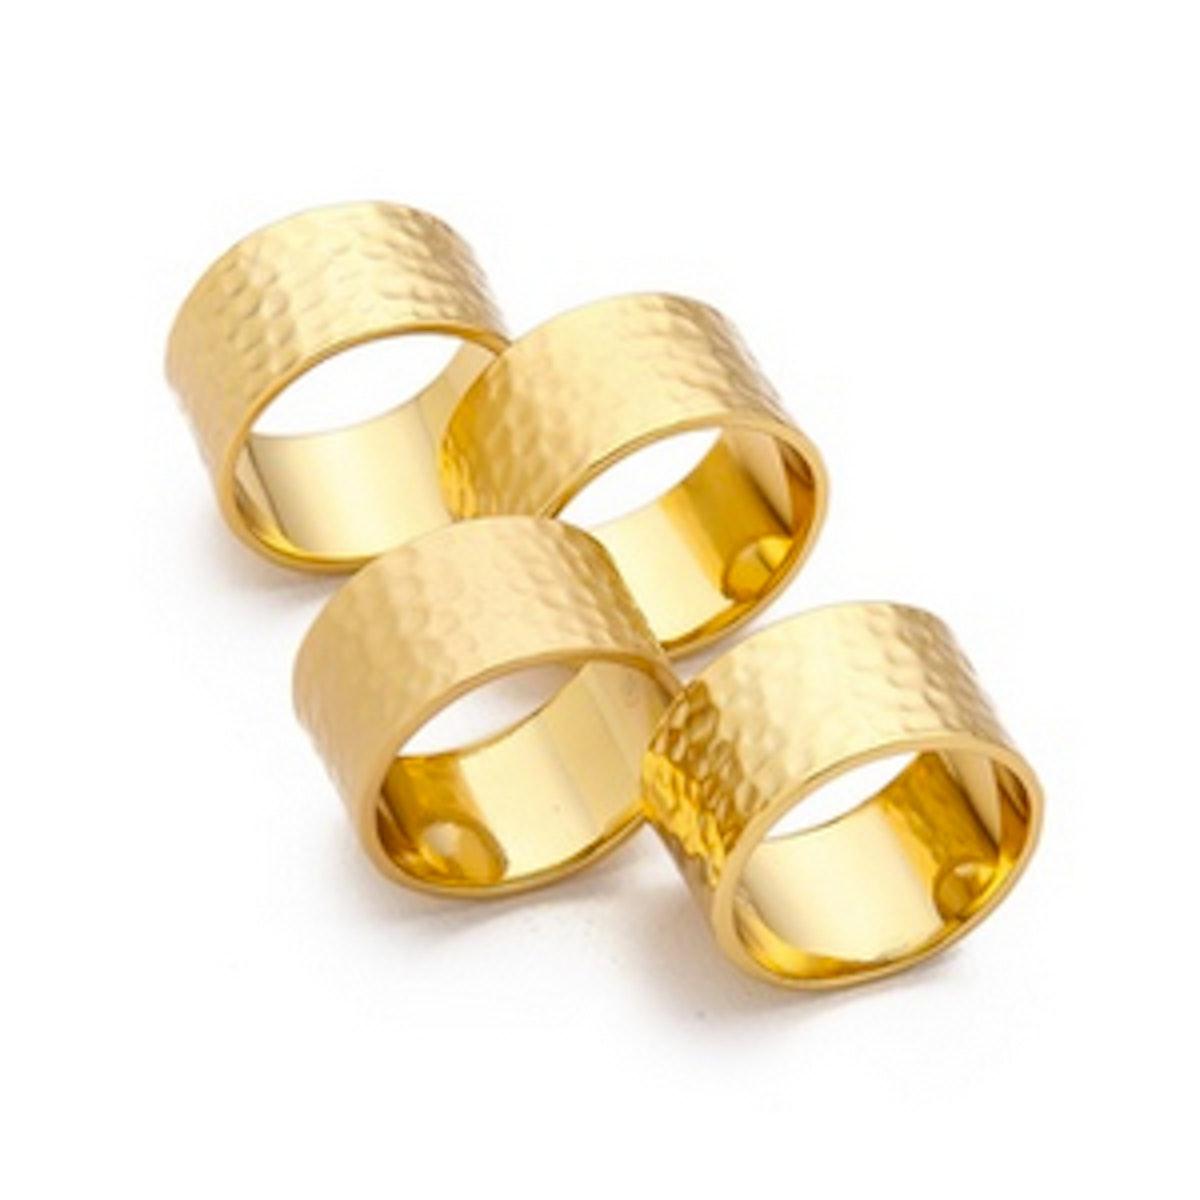 Camila Hammered Ring Set